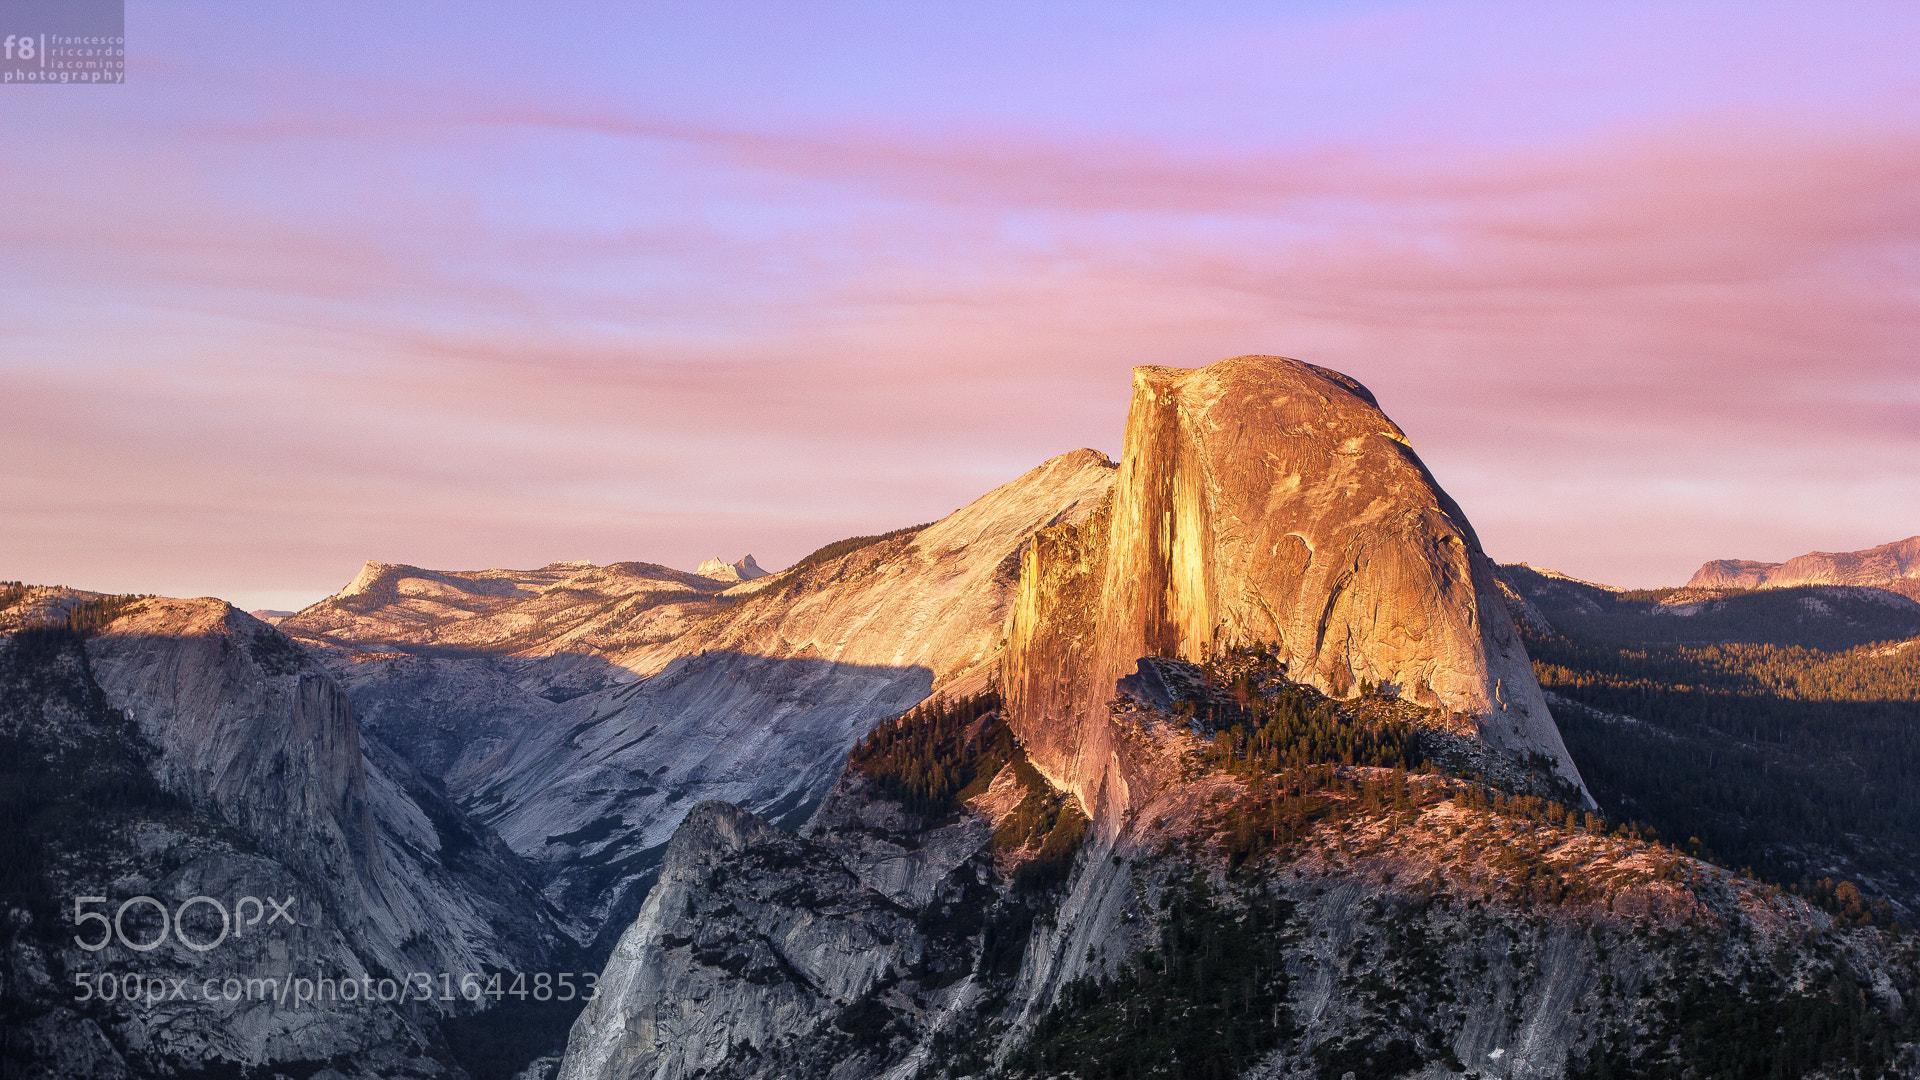 Photograph Yosemite by Francesco Riccardo Iacomino on 500px